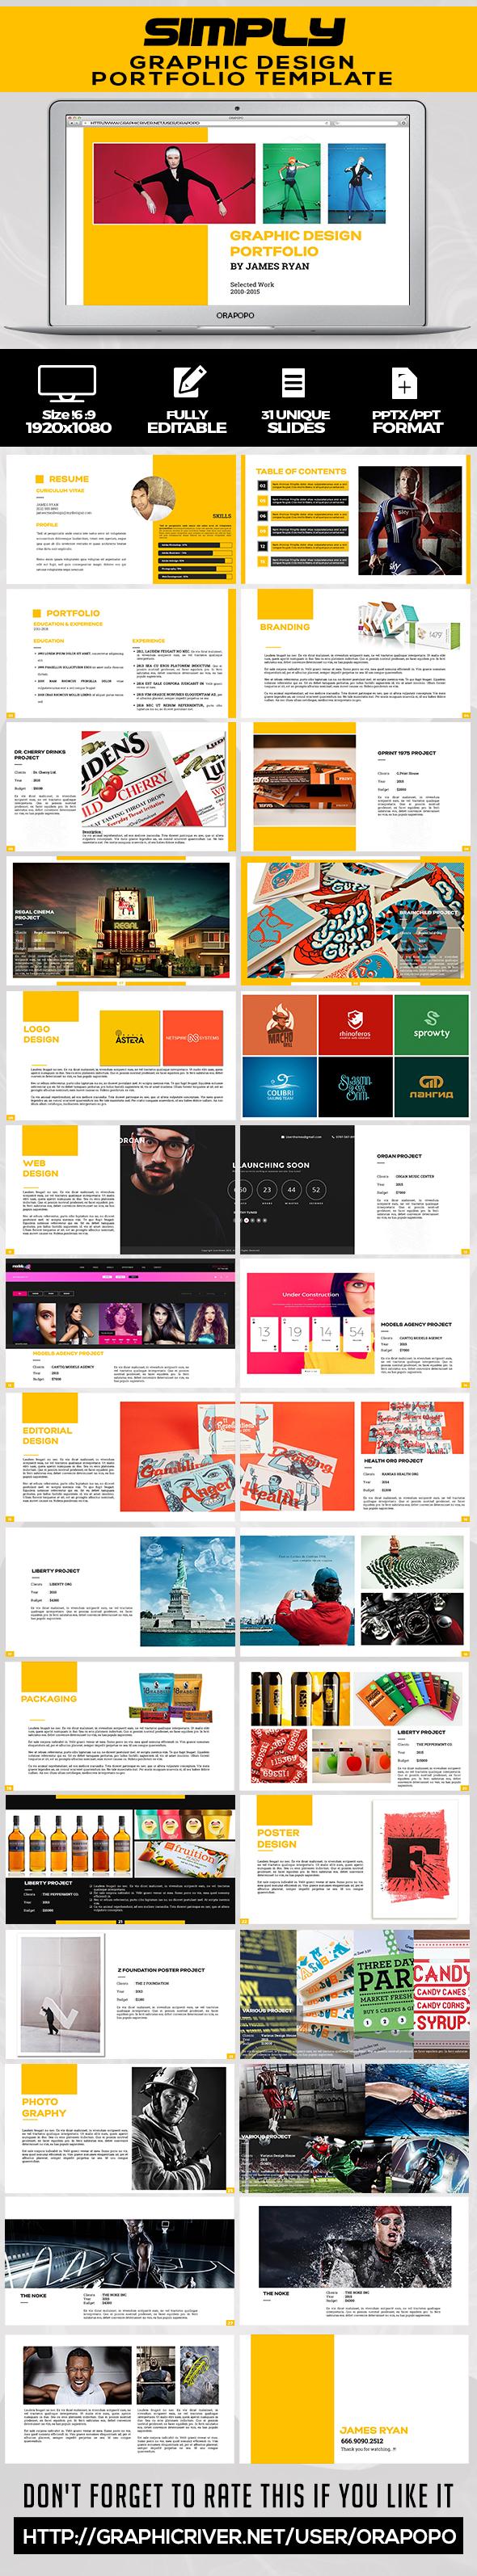 Graphic Designer Portfolio Graphics Designs Templates,Blueprint Layout Cottage Garden Design